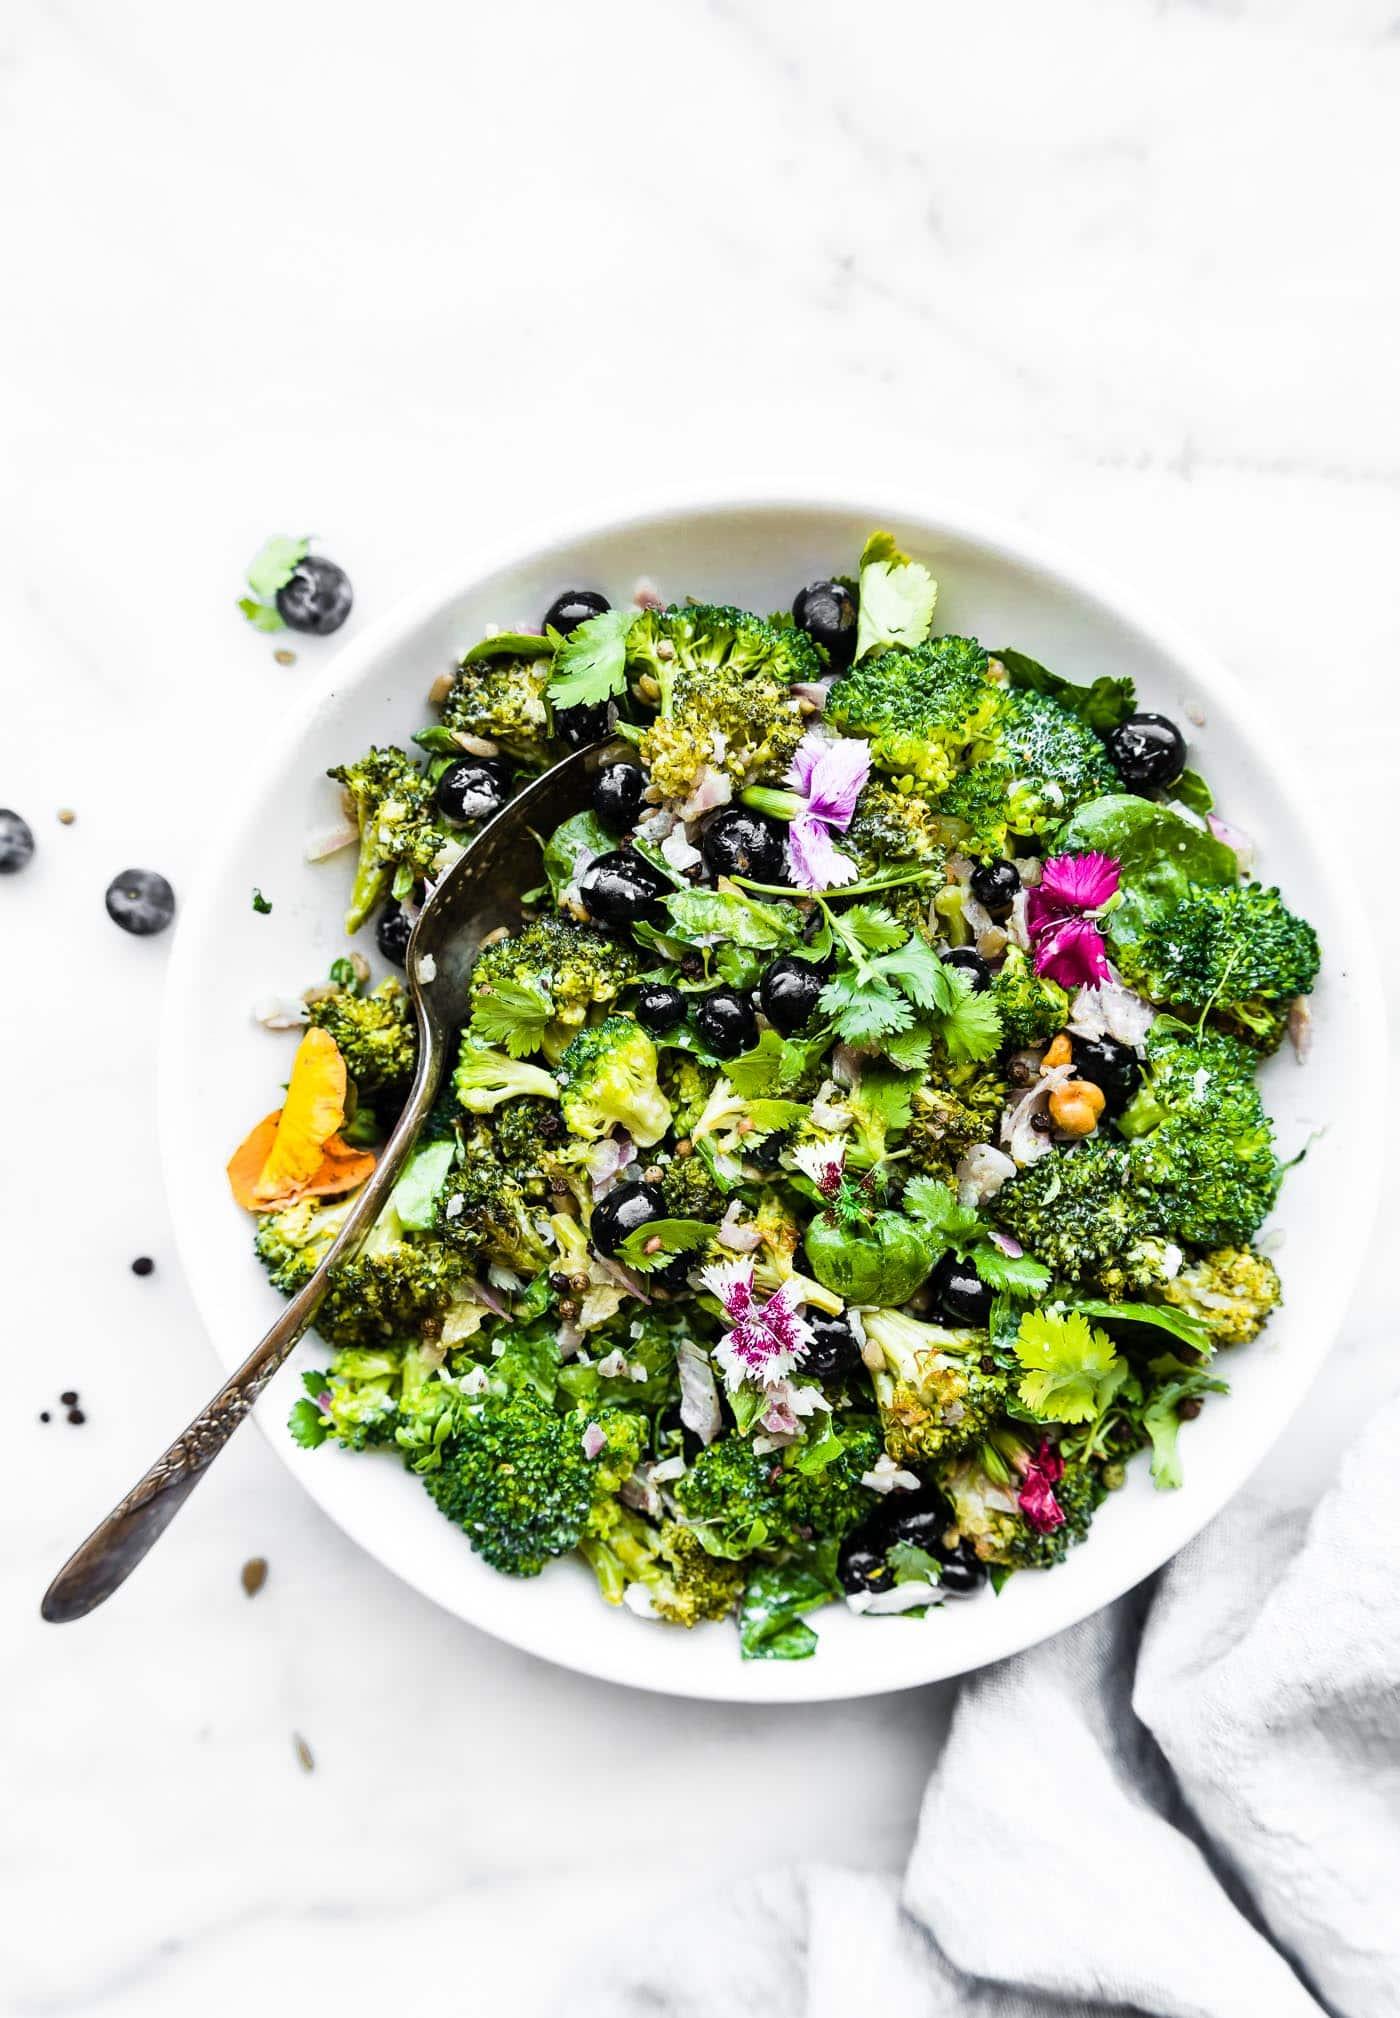 Broccoli Salad Recipe Without Mayo